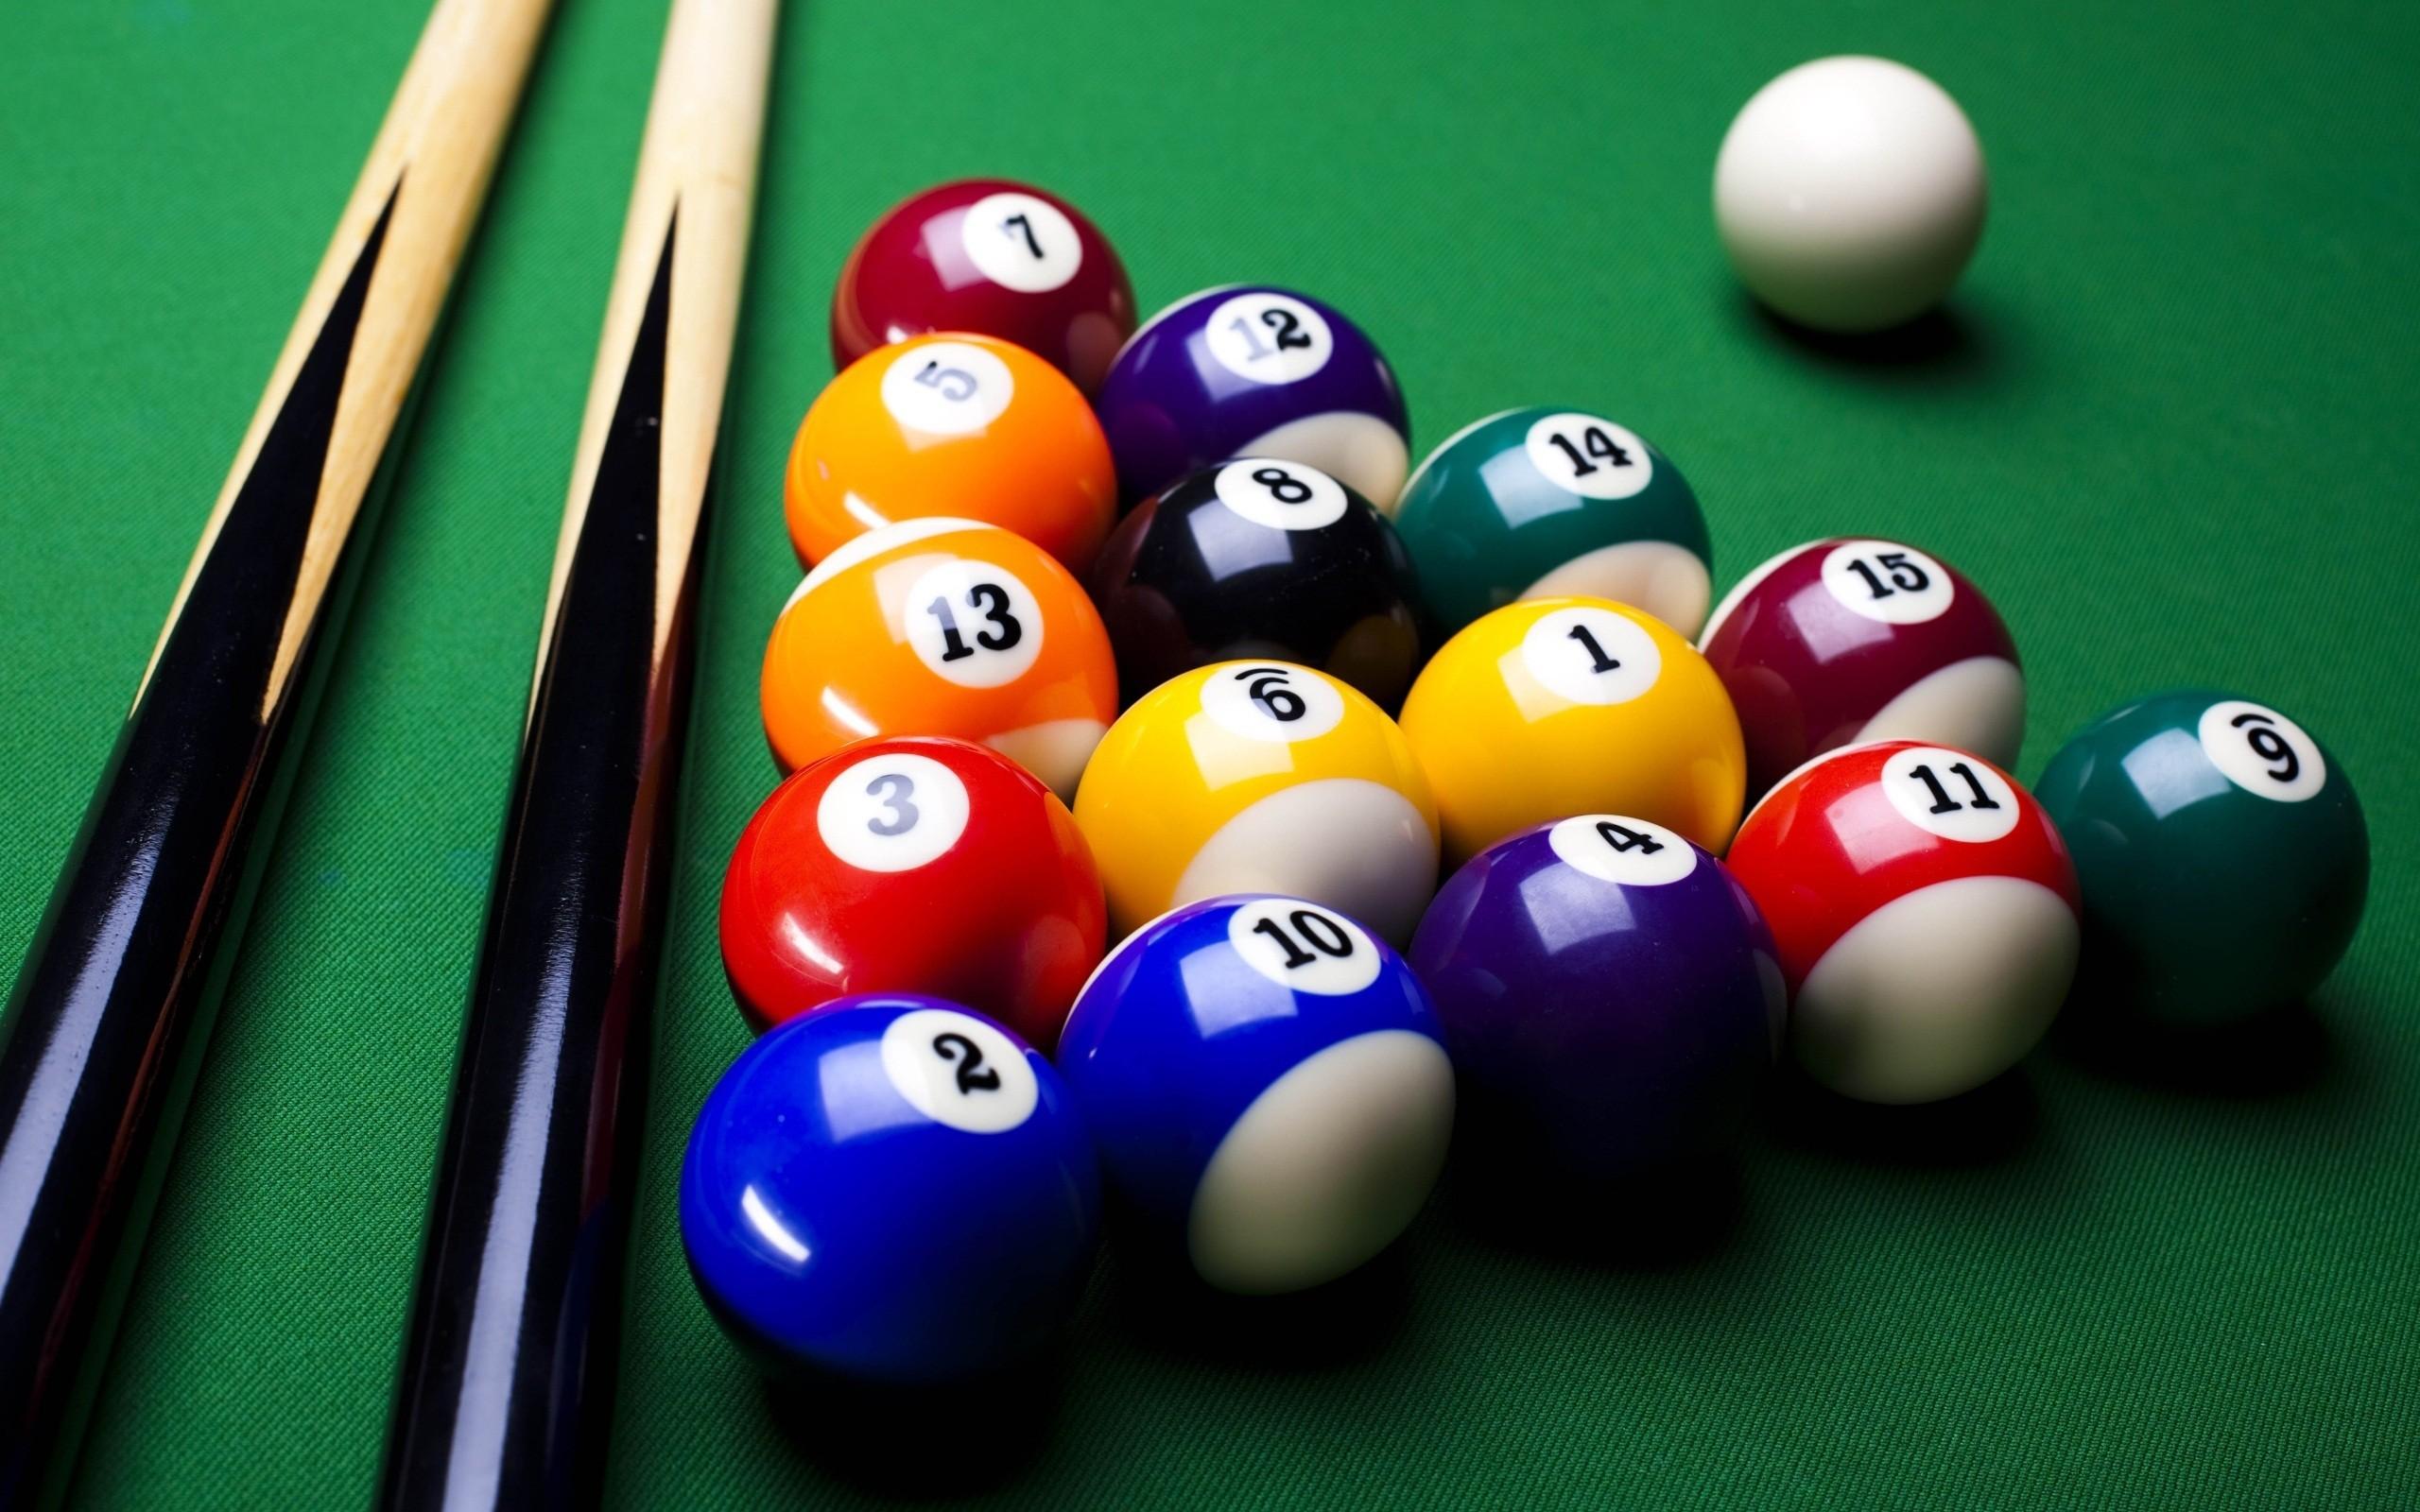 General 2560x1600 billiard balls pool table 8-ball colorful